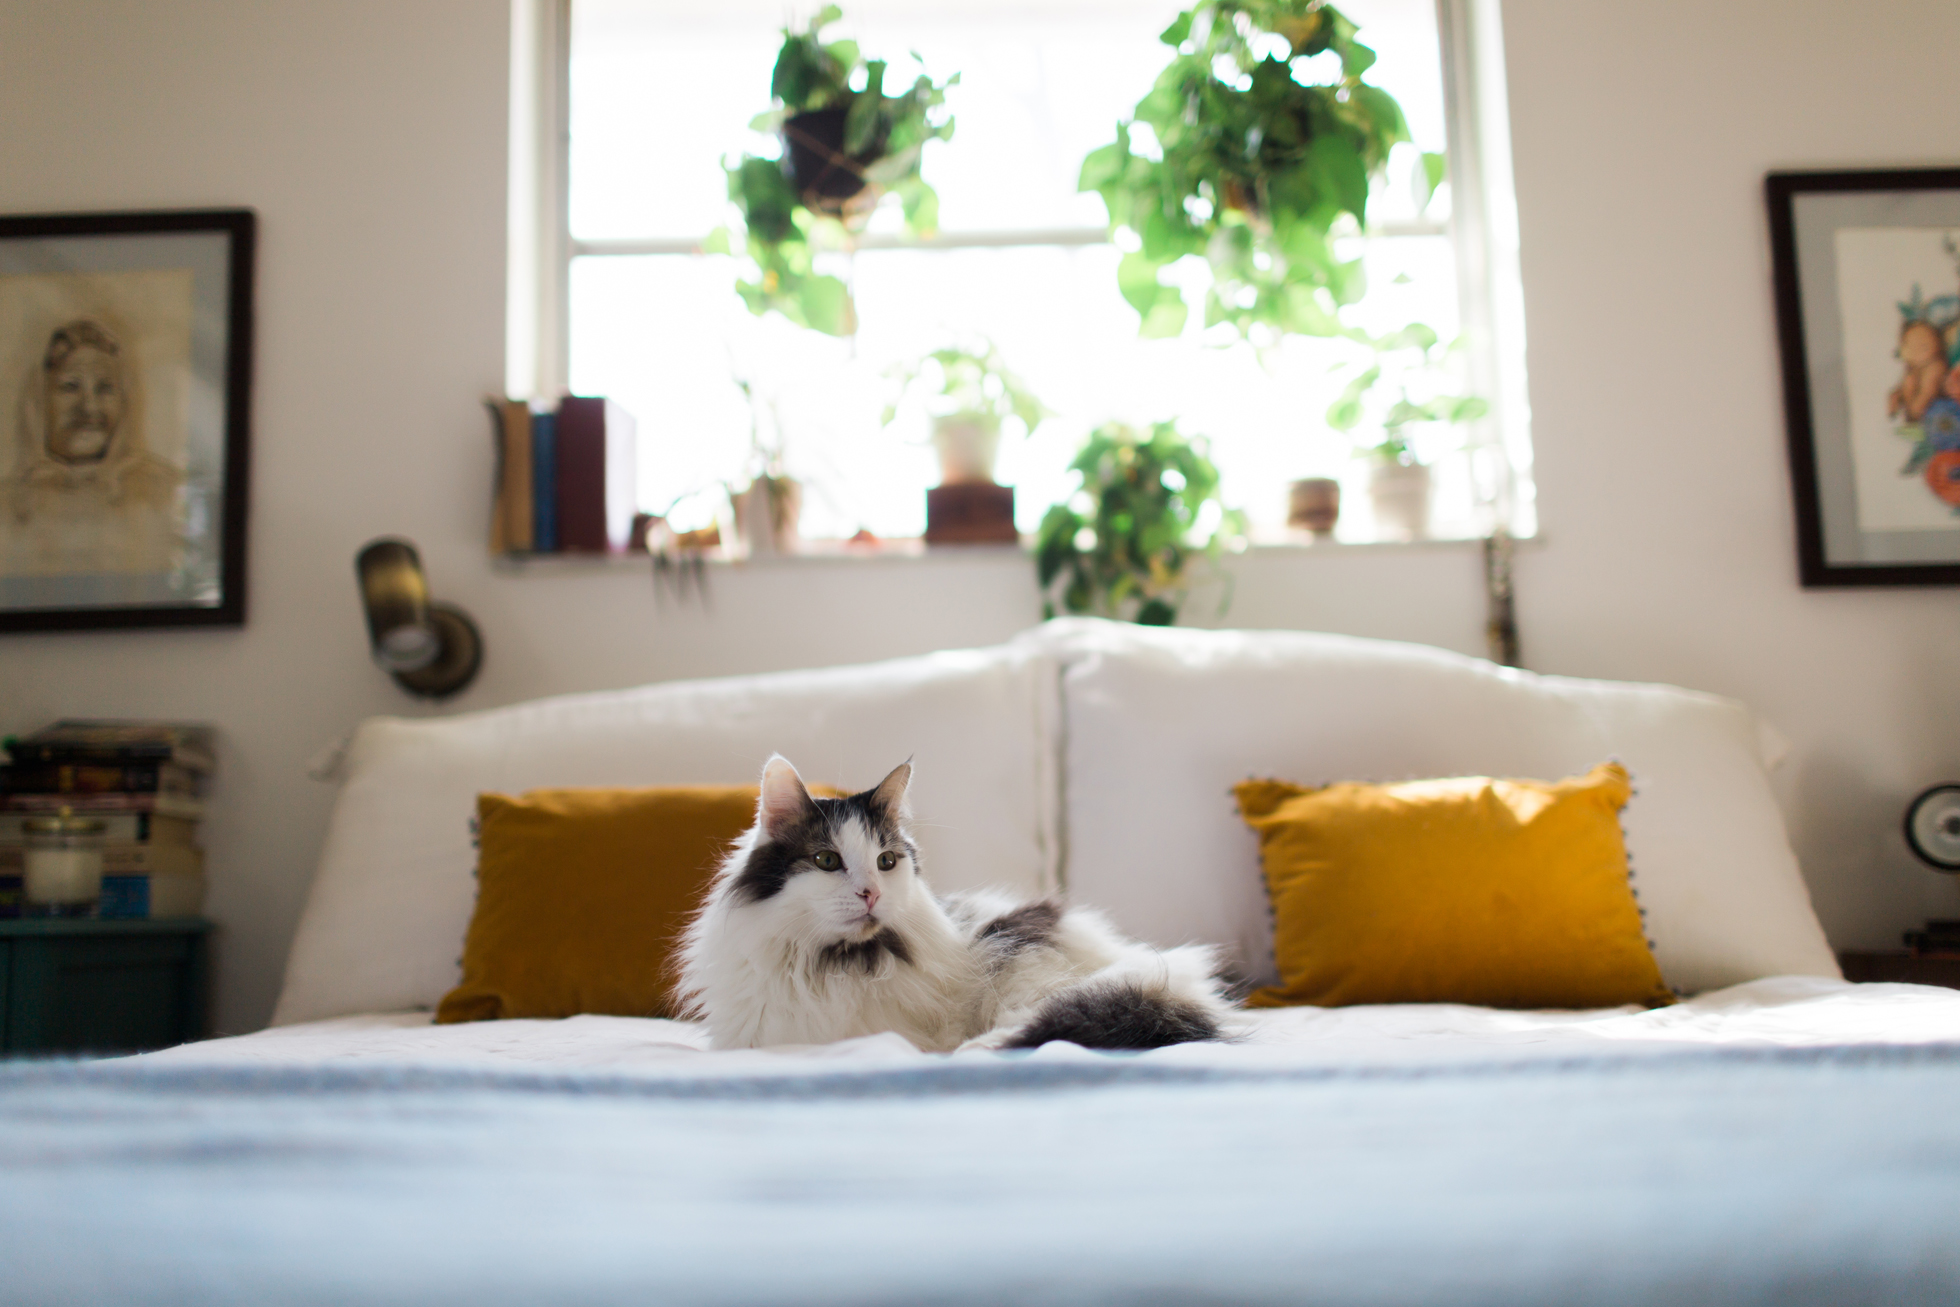 Cat lounging on a new mattress